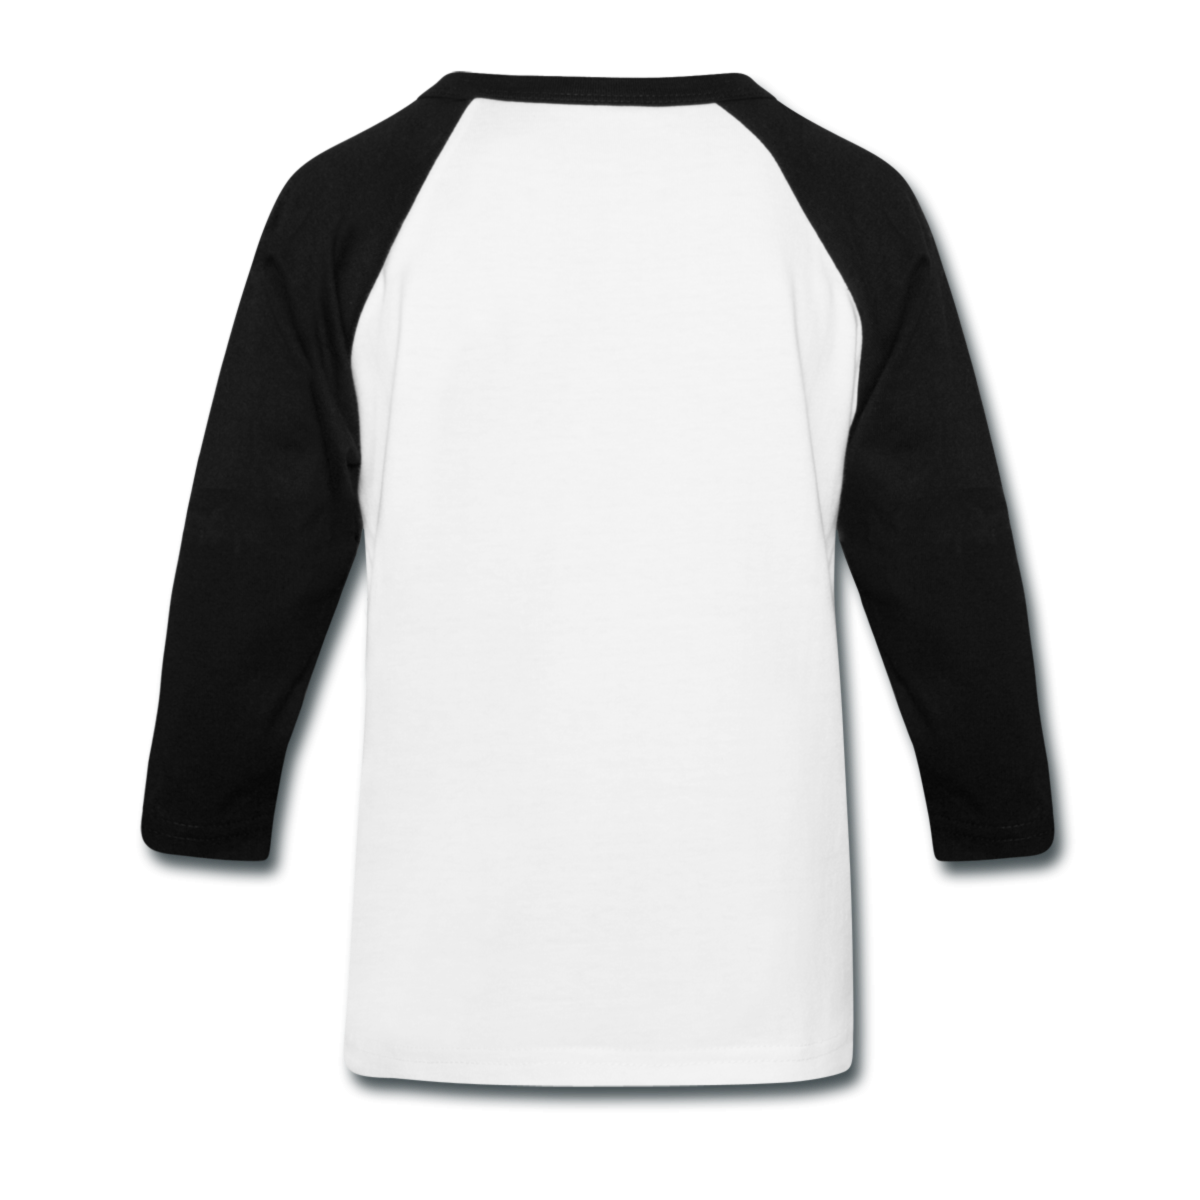 Baseball logo clipart free black and white clipart royalty free download Baseball Shirt Clipart clipart royalty free download